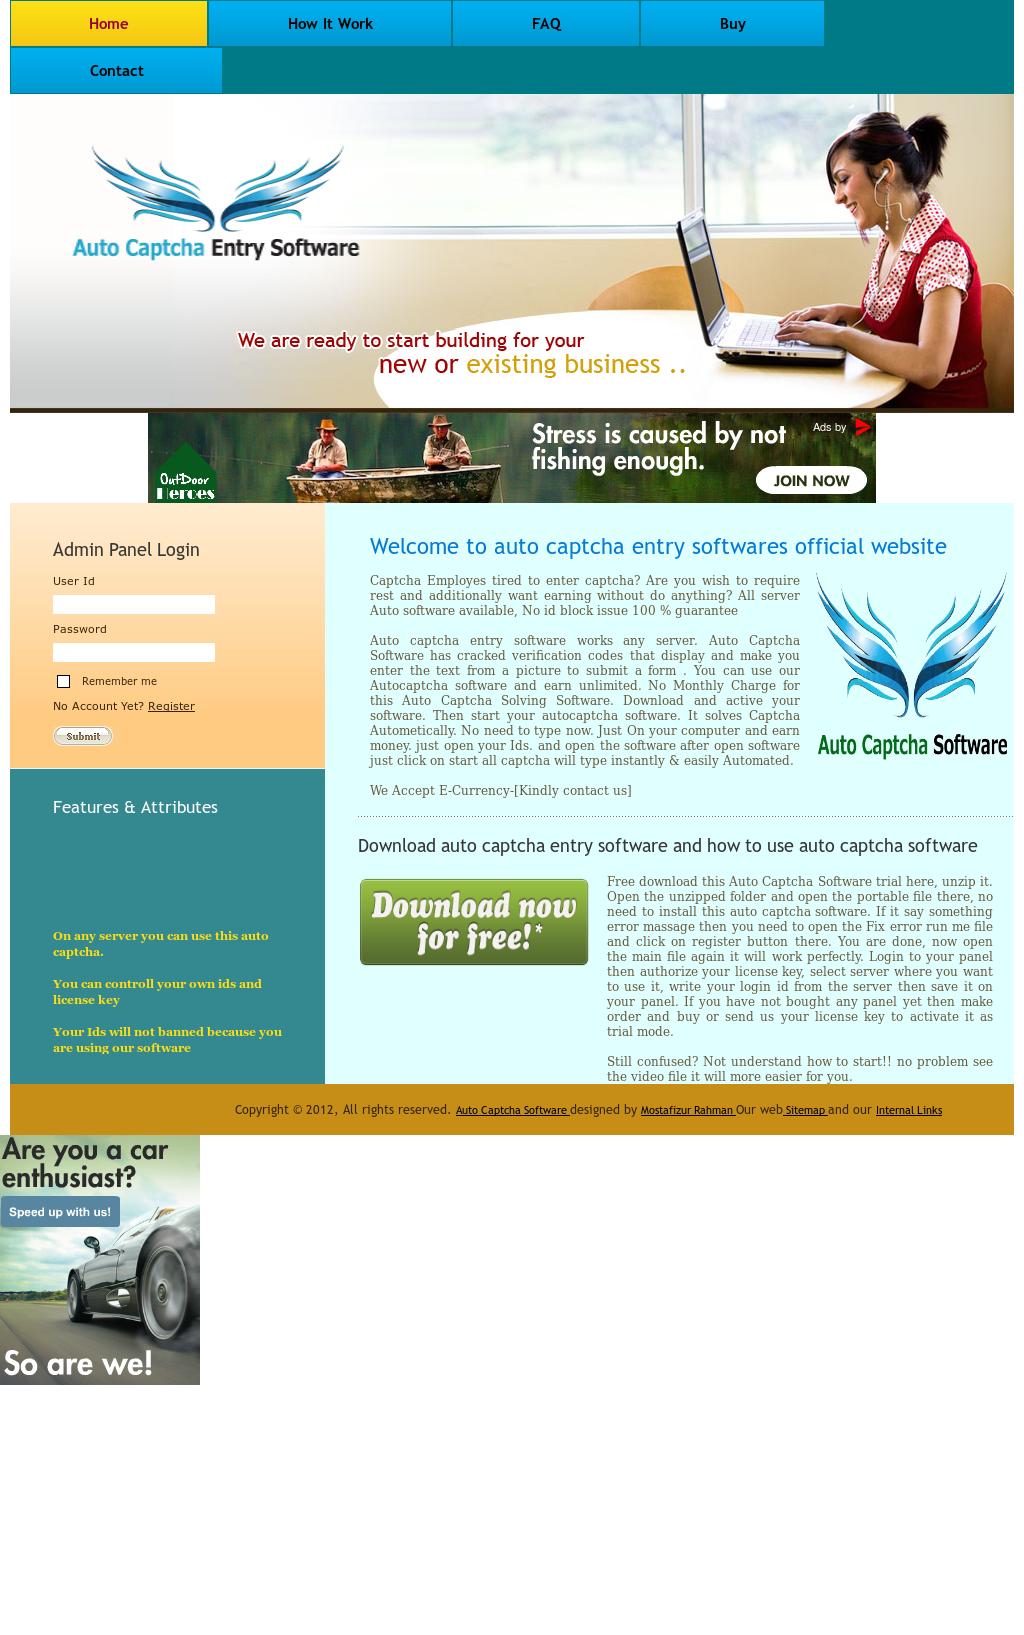 Auto Captcha Entry Software Competitors, Revenue and